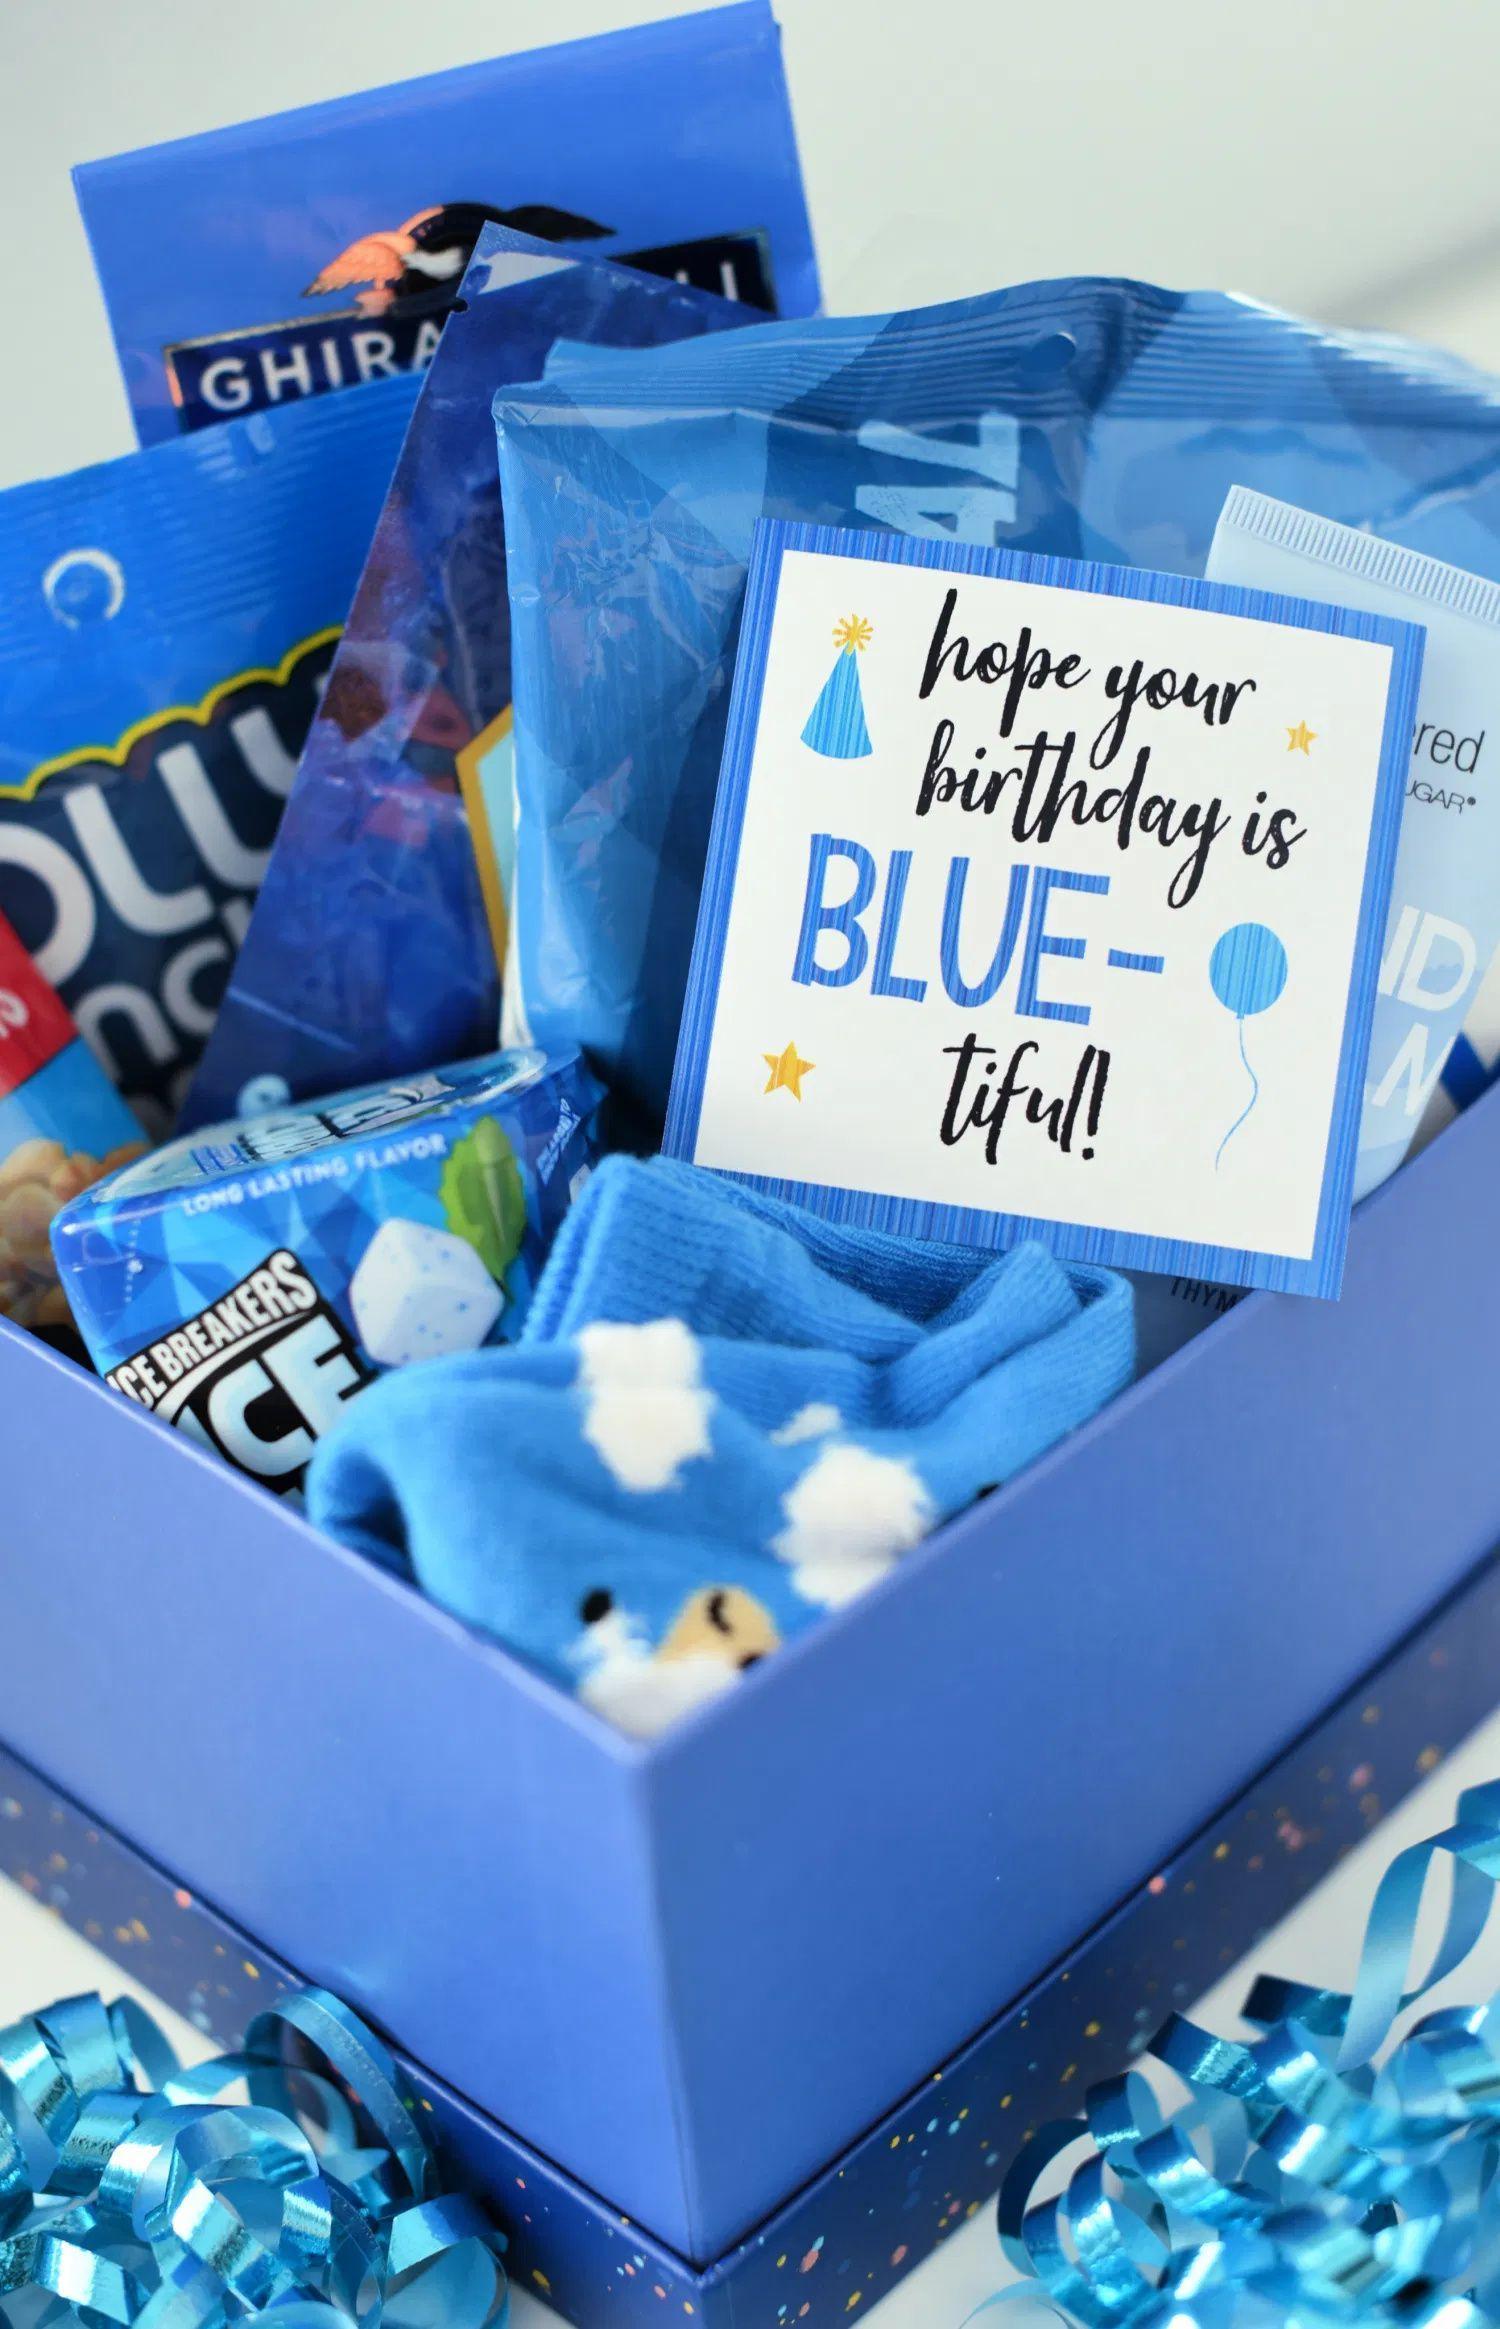 Blue-Themed Birthday Gift Idea in 2020 | Bff birthday gift. Cute birthday gift. Friend birthday gifts